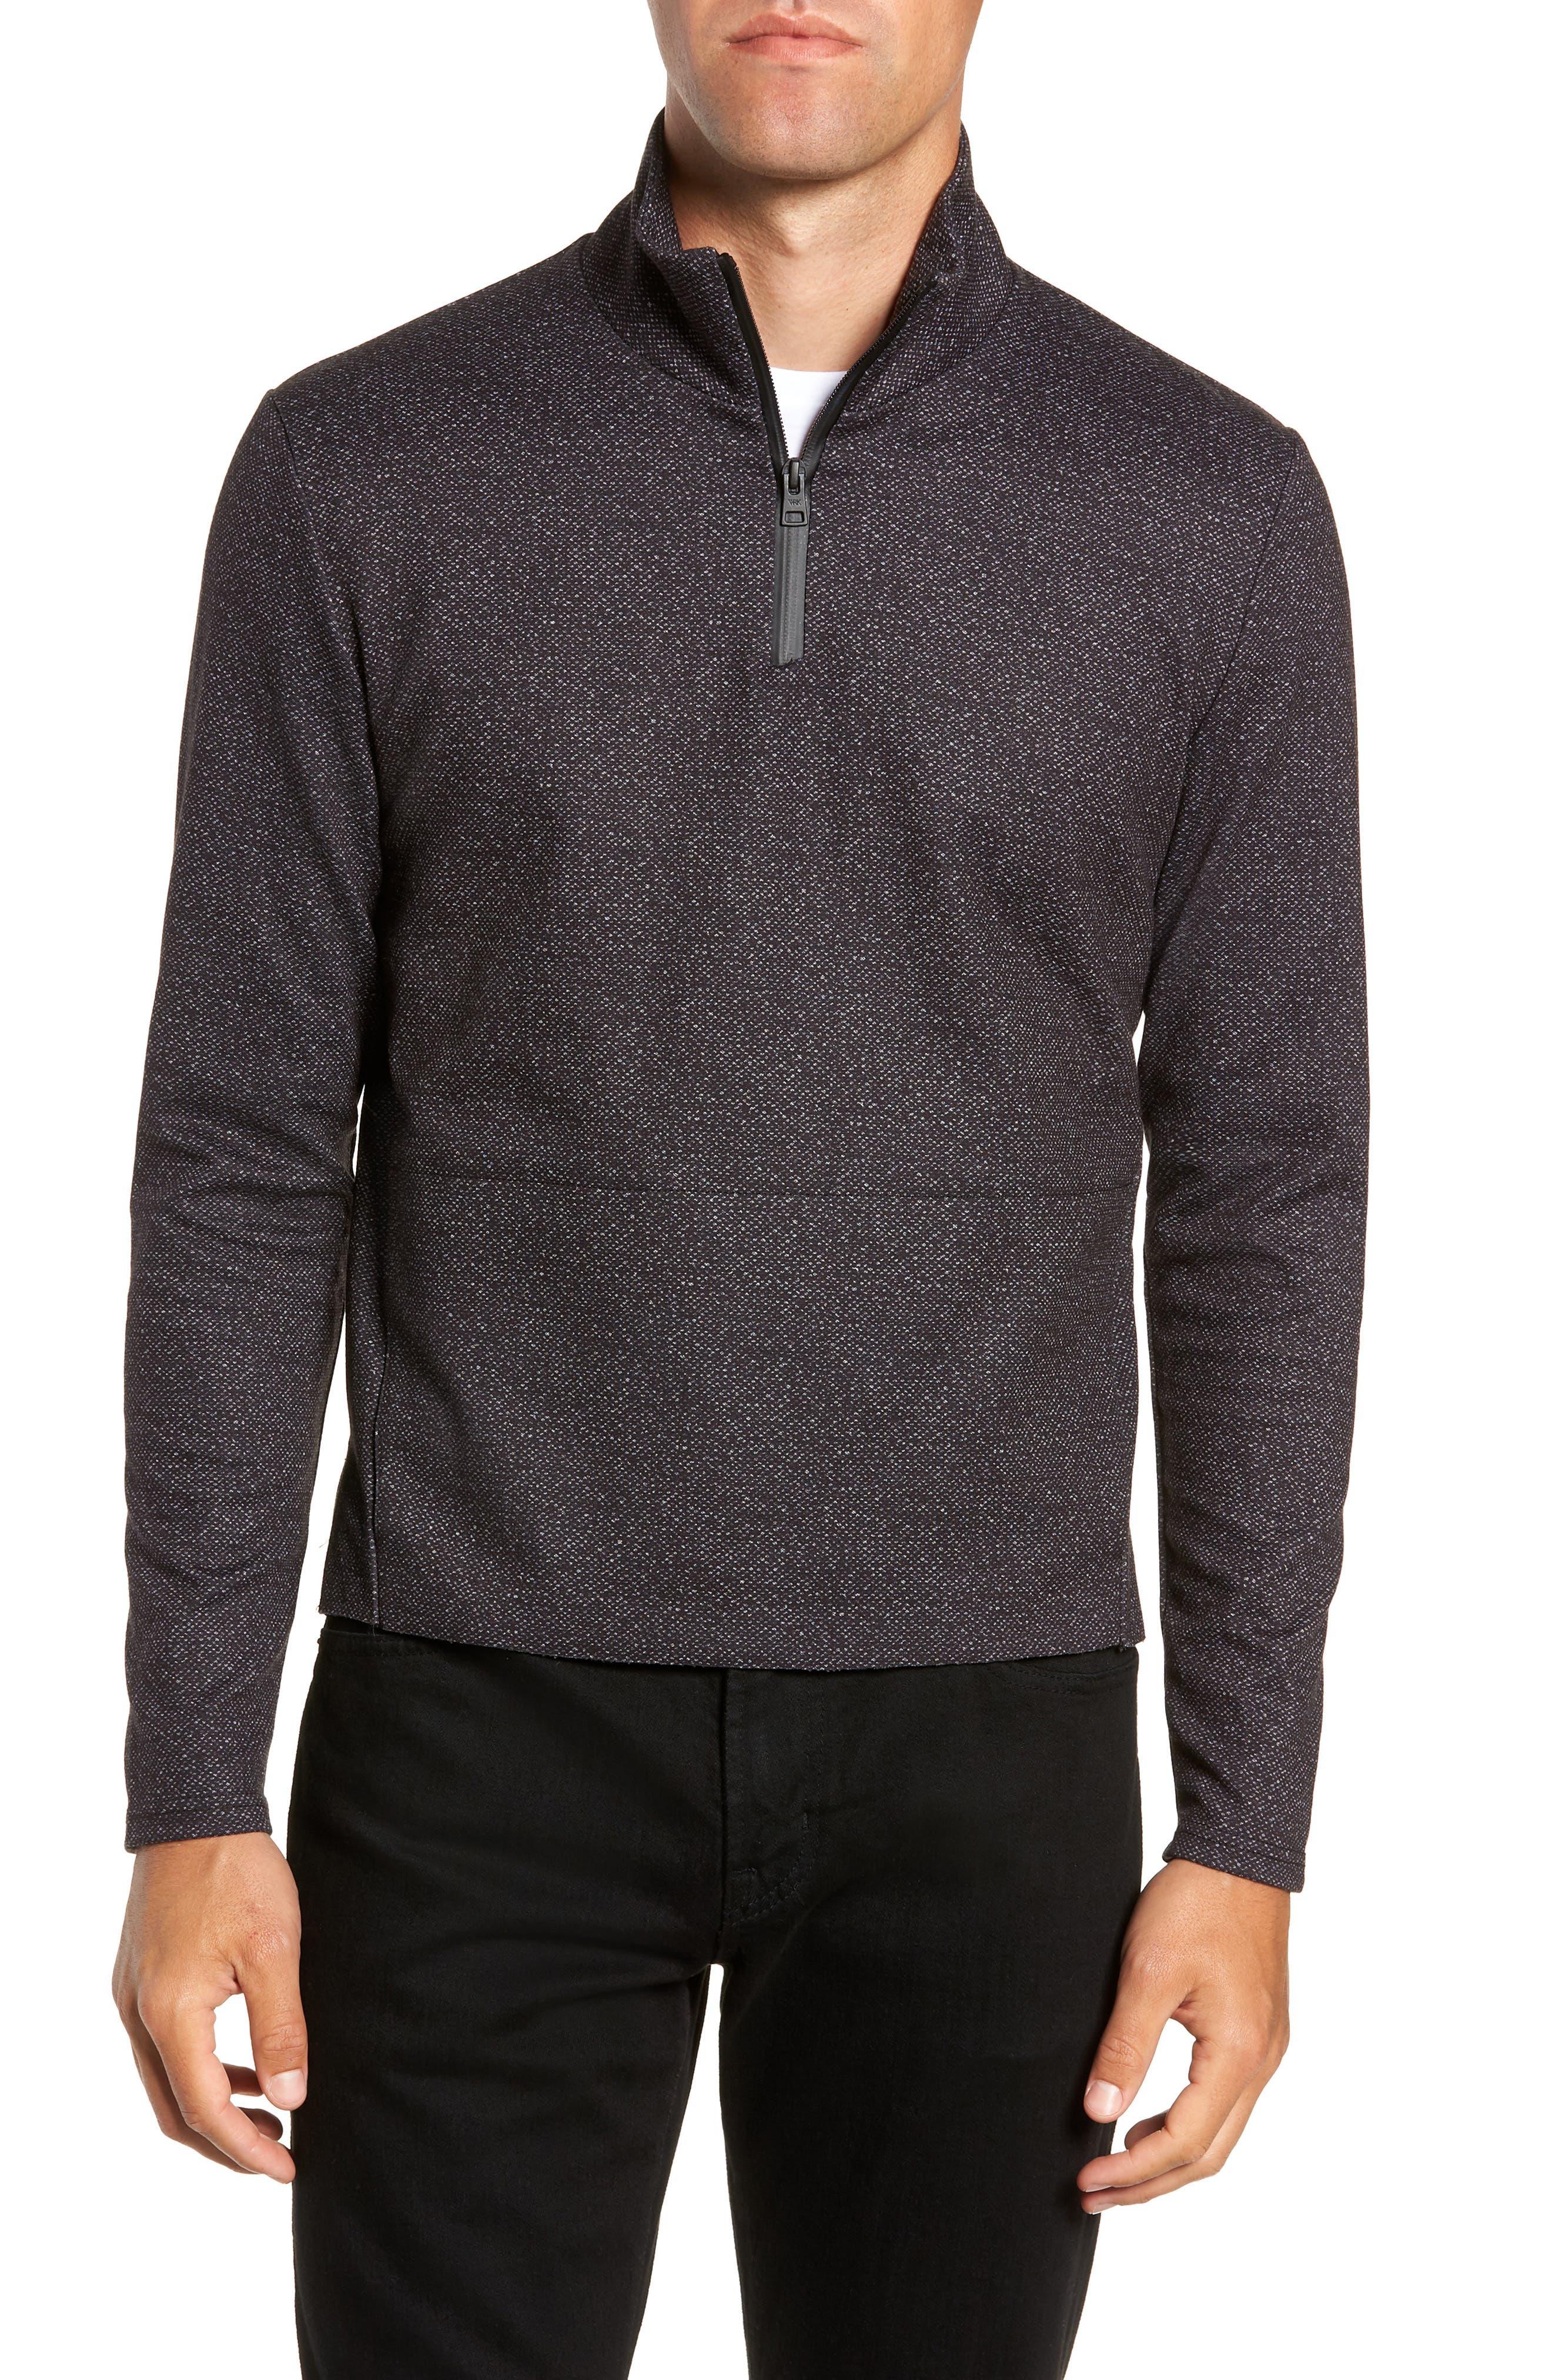 Oscar Quarter Zip Slim Fit Sweater,                         Main,                         color, CHARCOAL